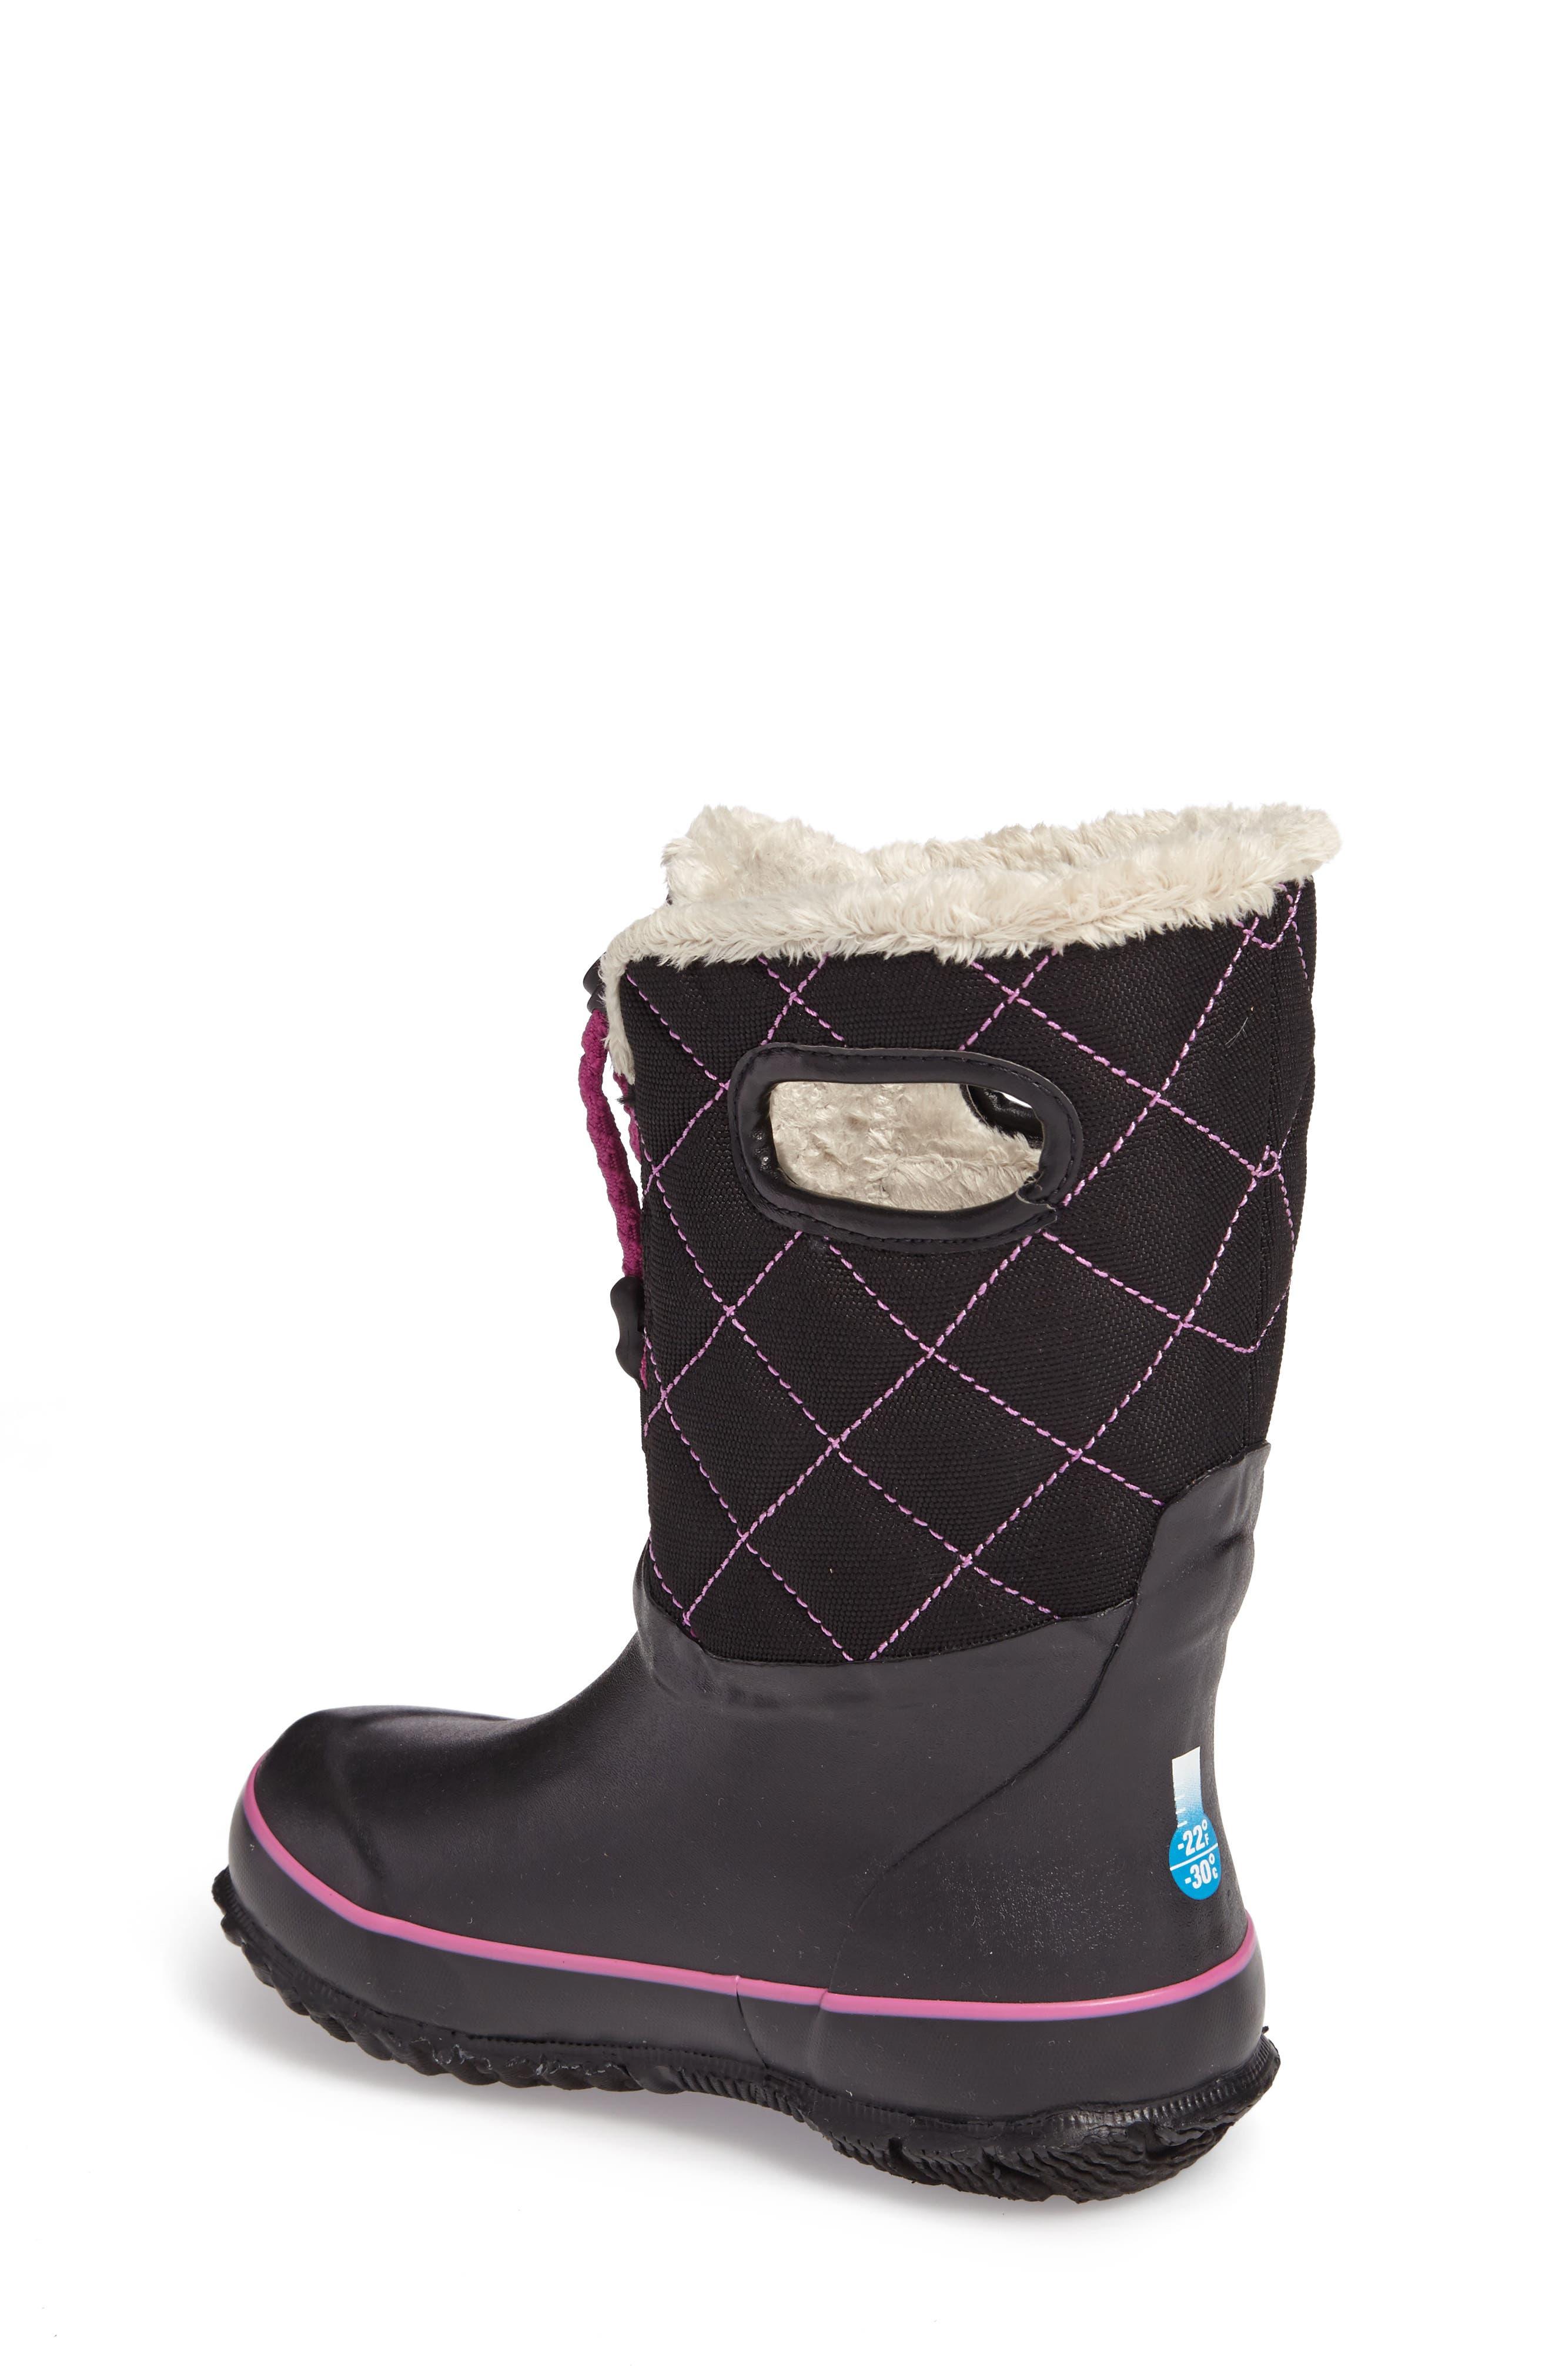 Juno Faux Fur Insulated Waterproof Boot,                             Alternate thumbnail 2, color,                             Black Multi